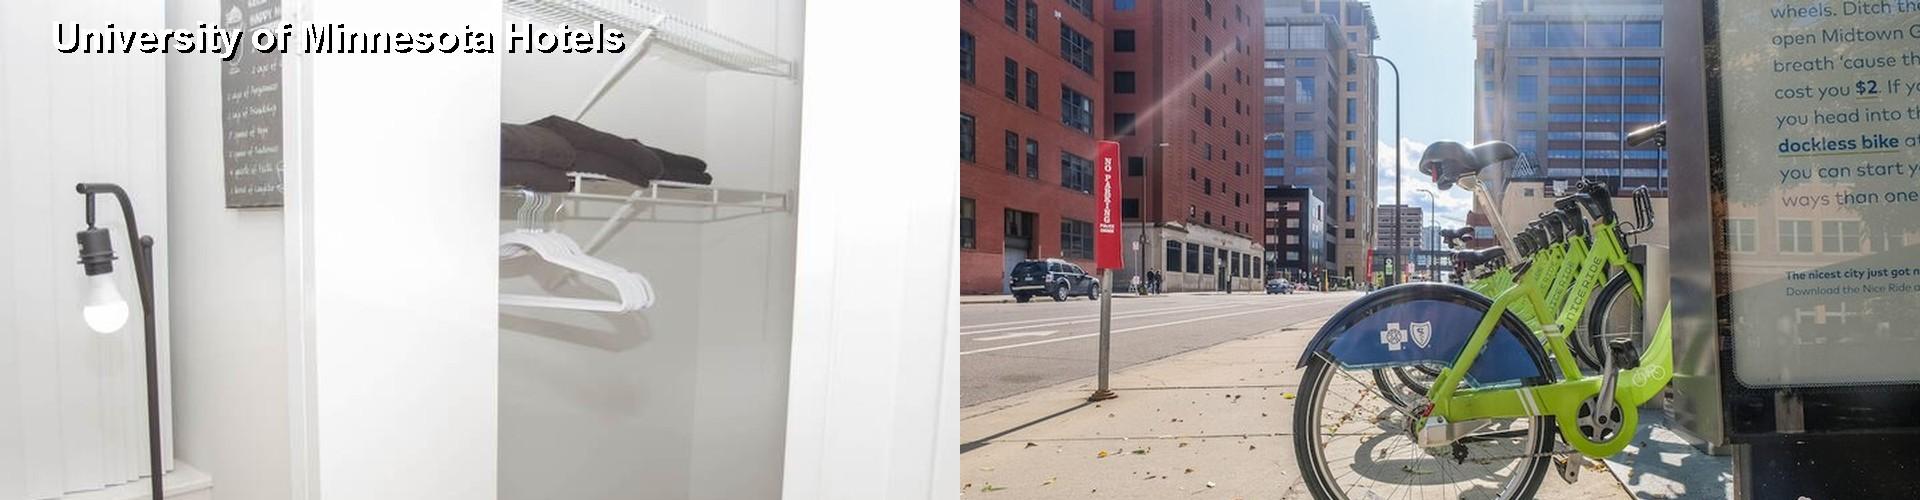 5 Best Hotels Near University Of Minnesota